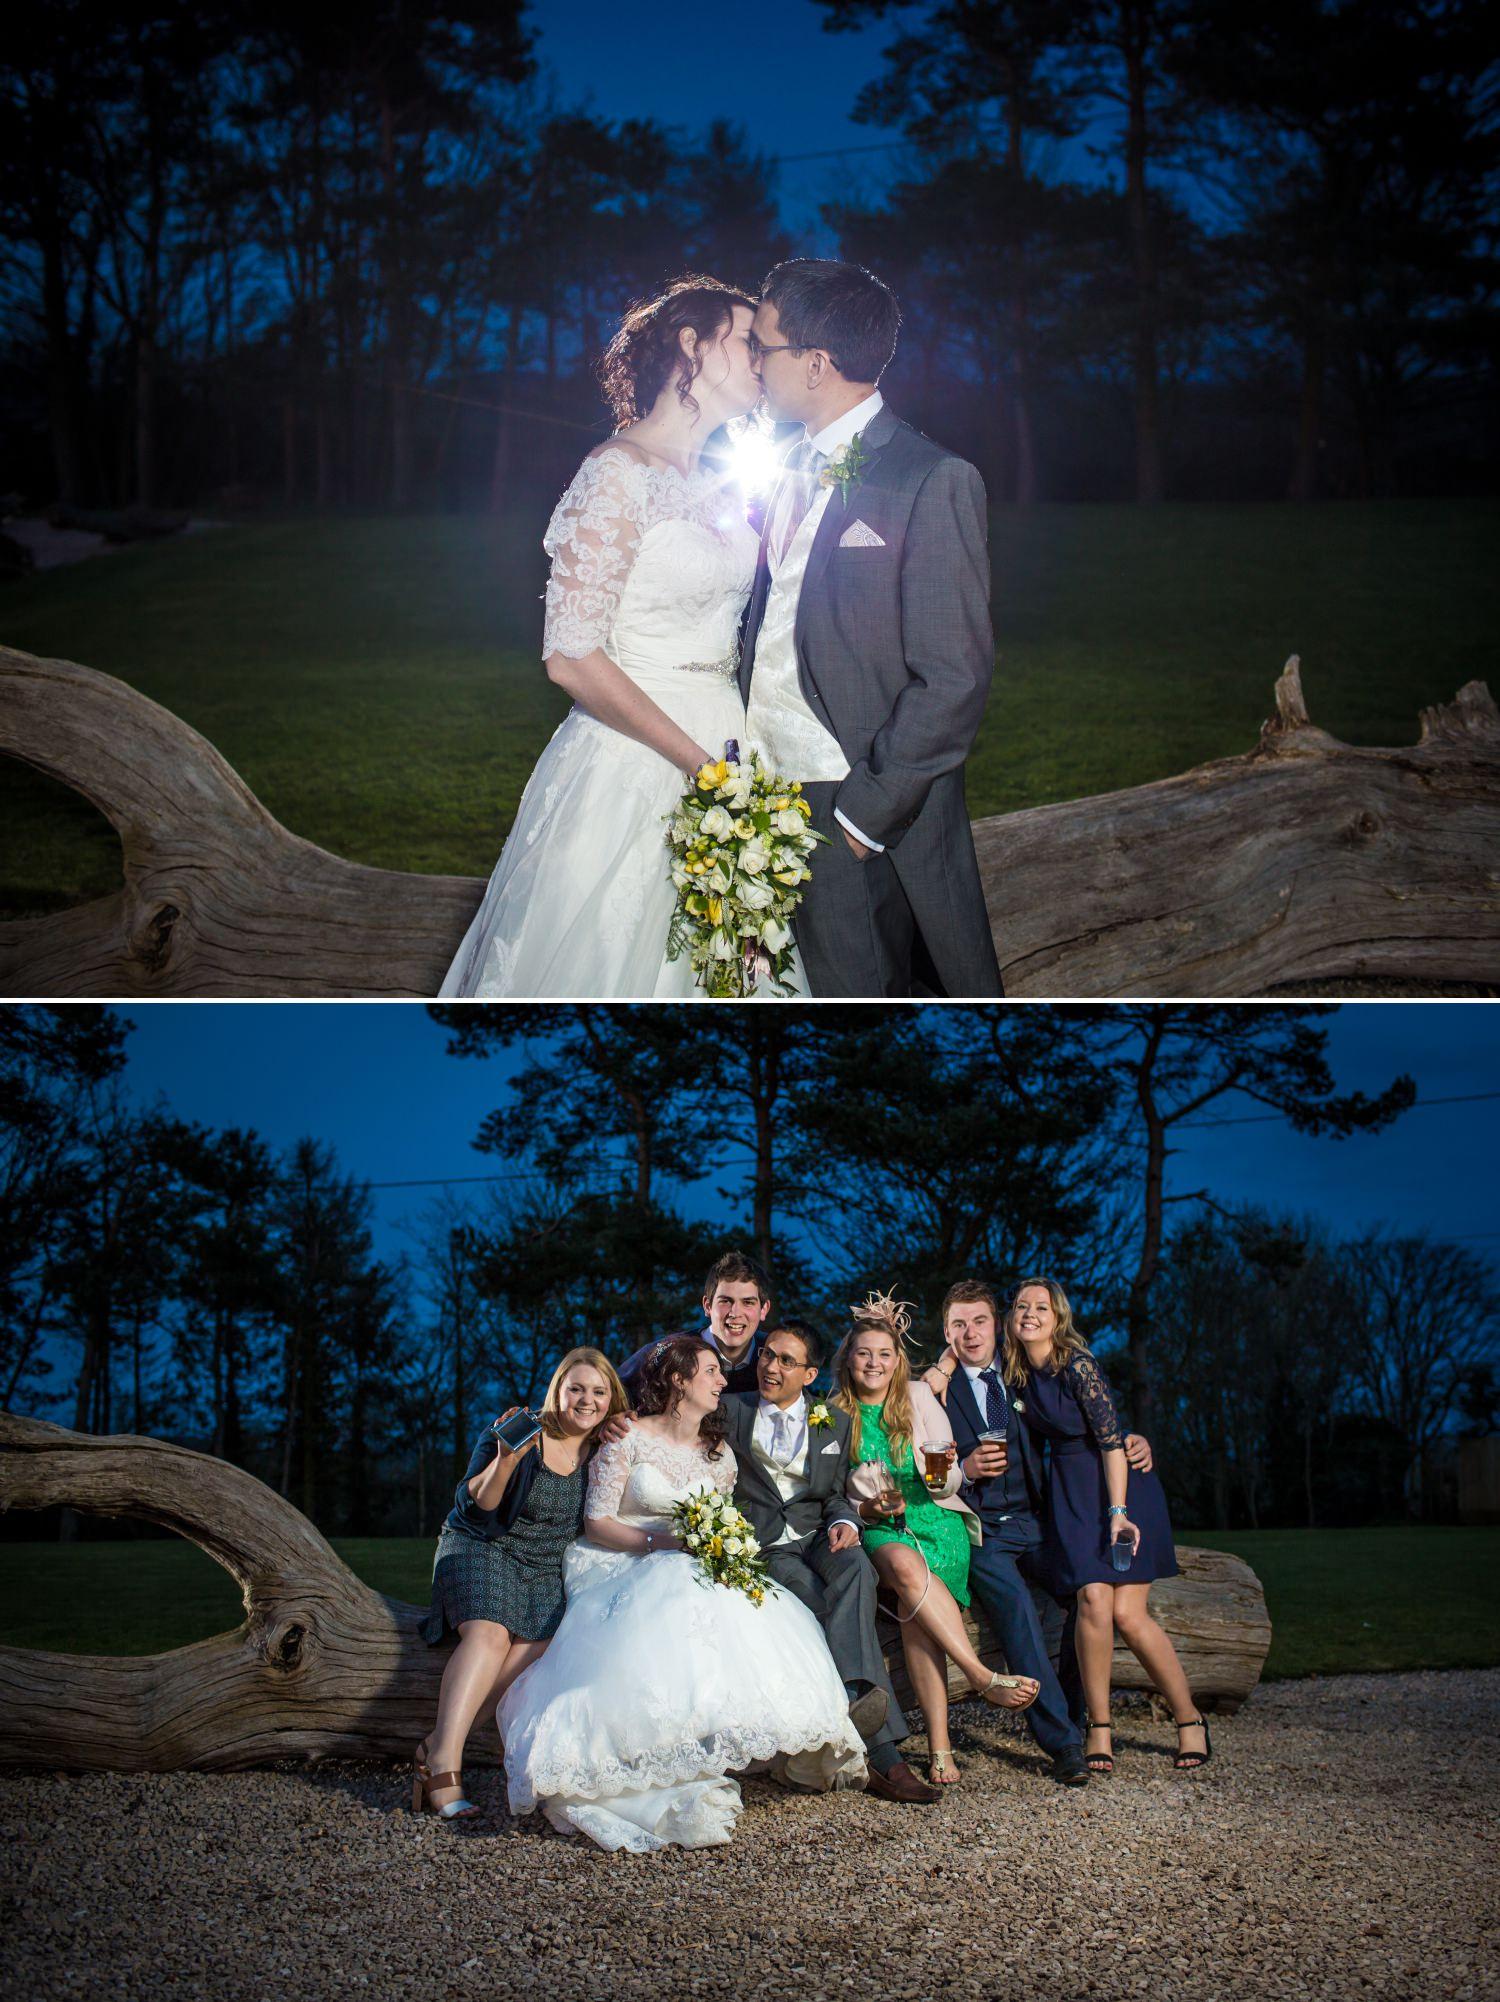 Evening wedding Photographs at Pimhill Barn, Shropshire